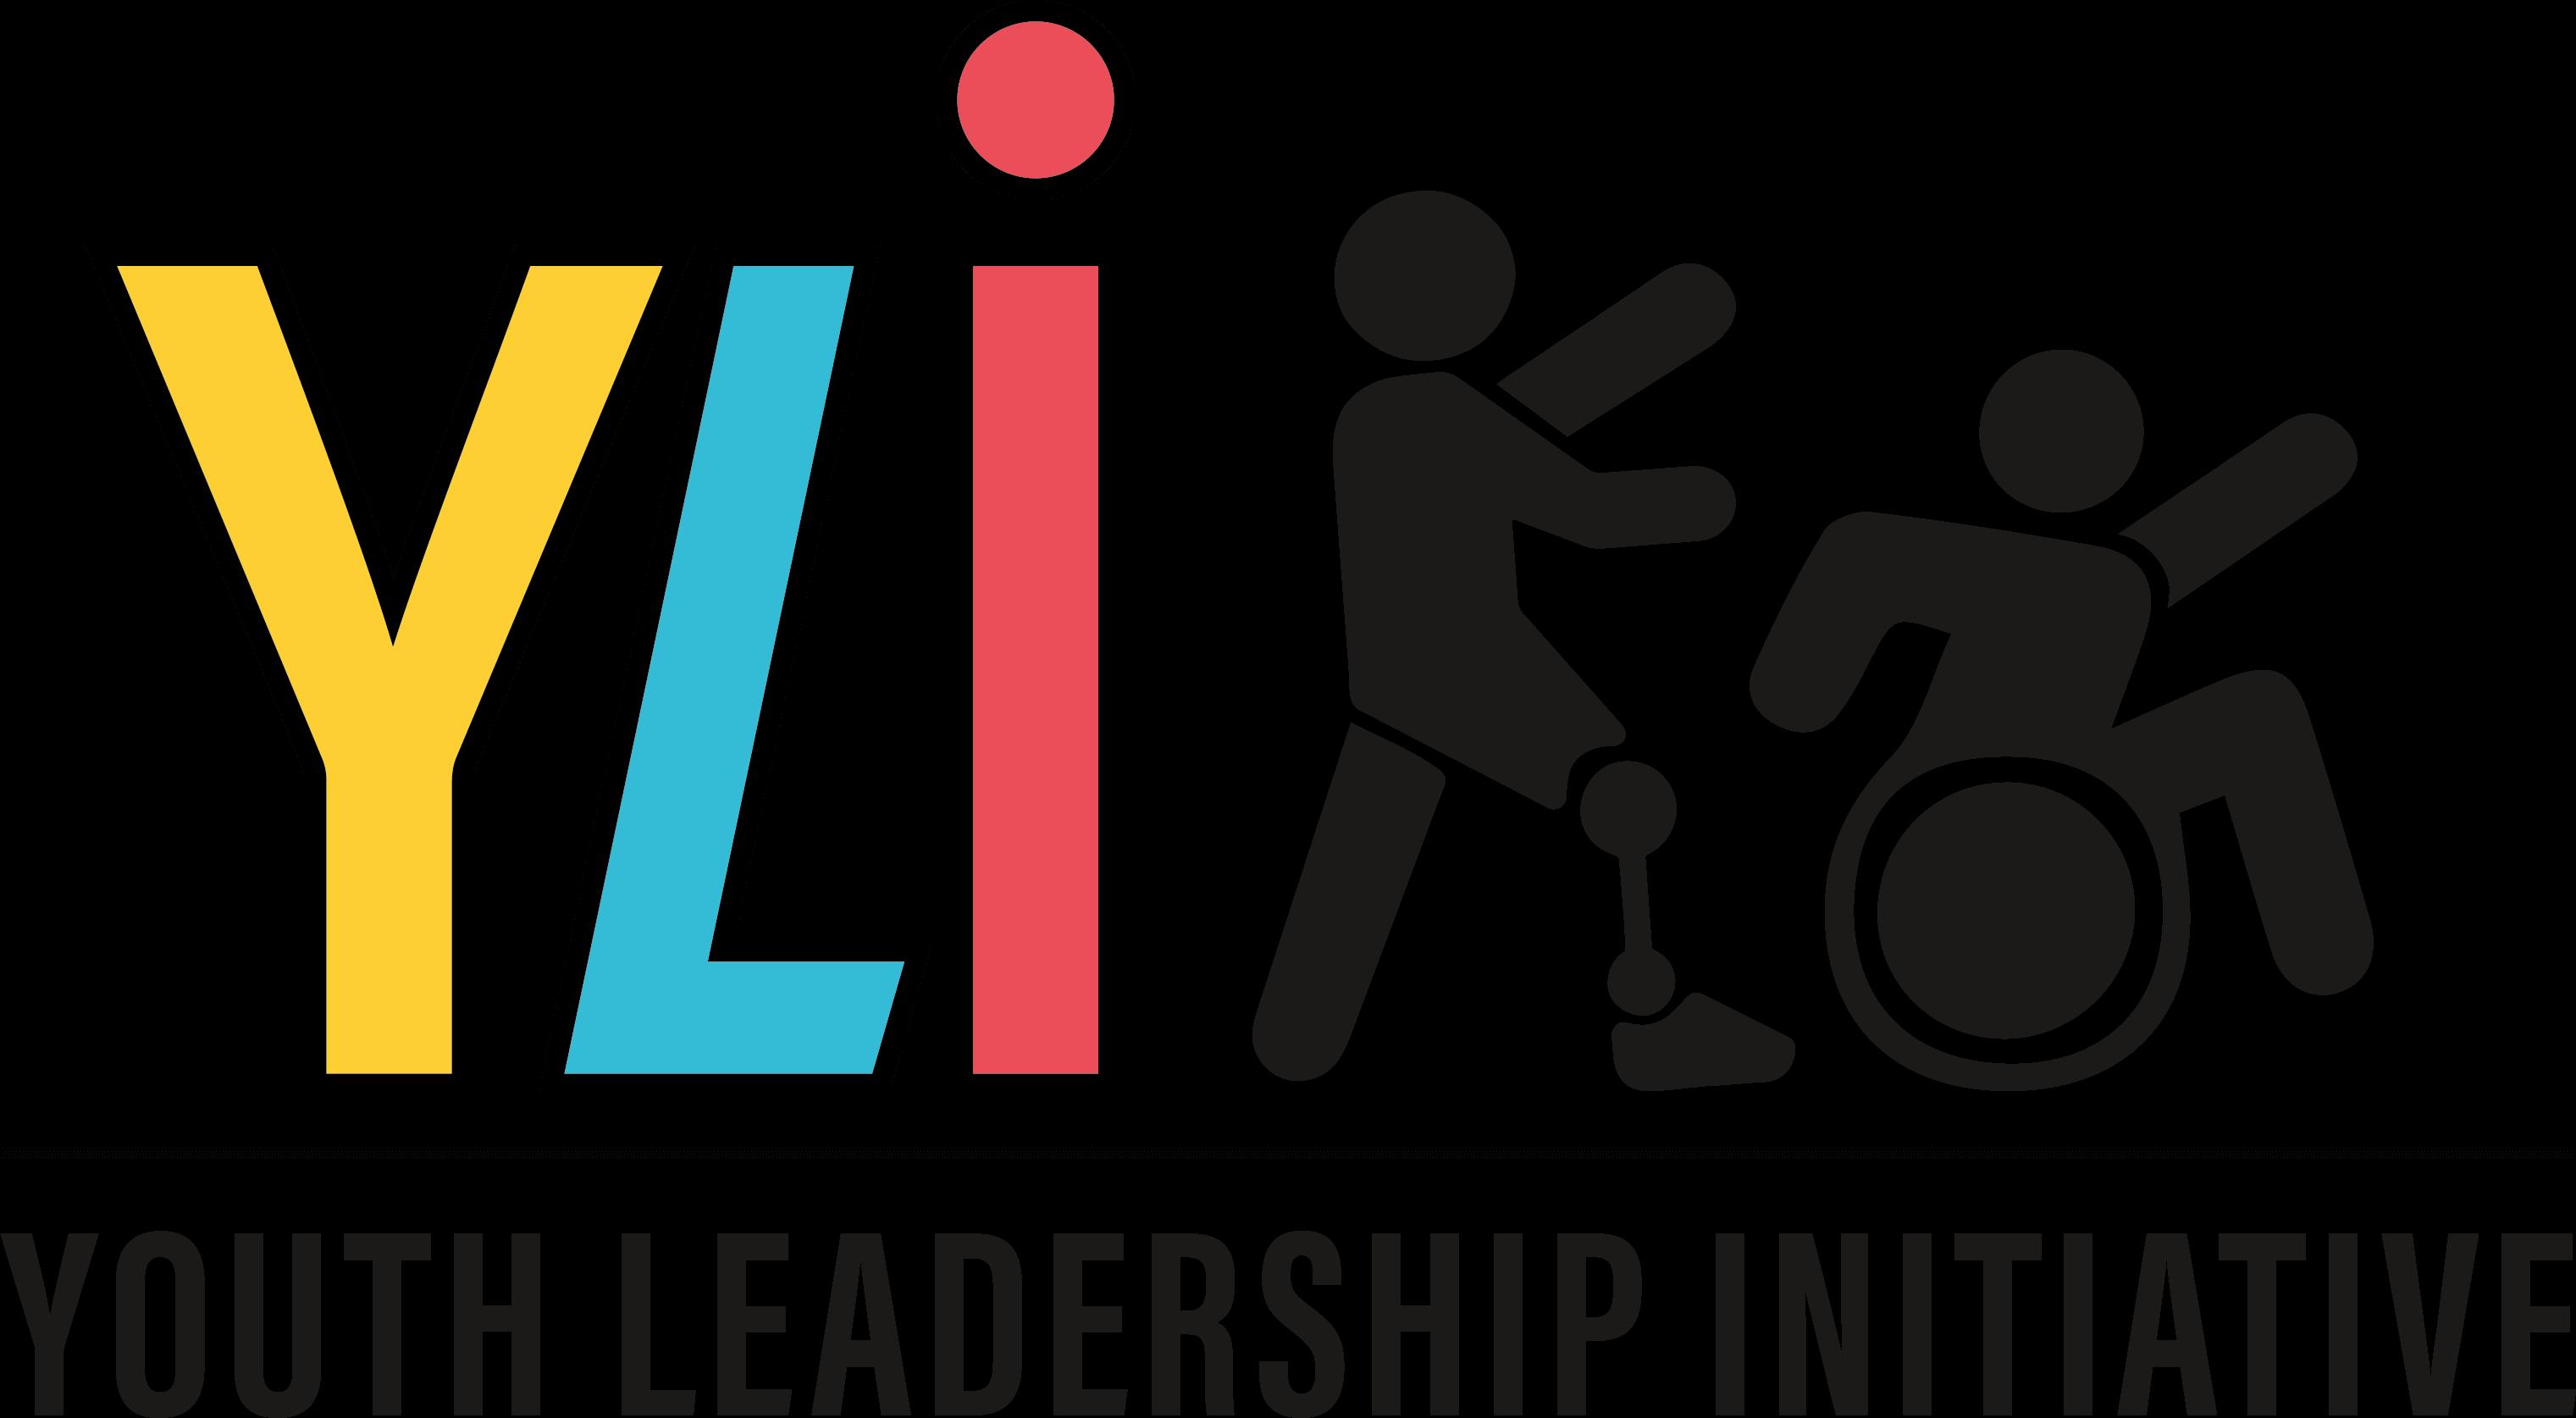 Youth Leadership Initiative.